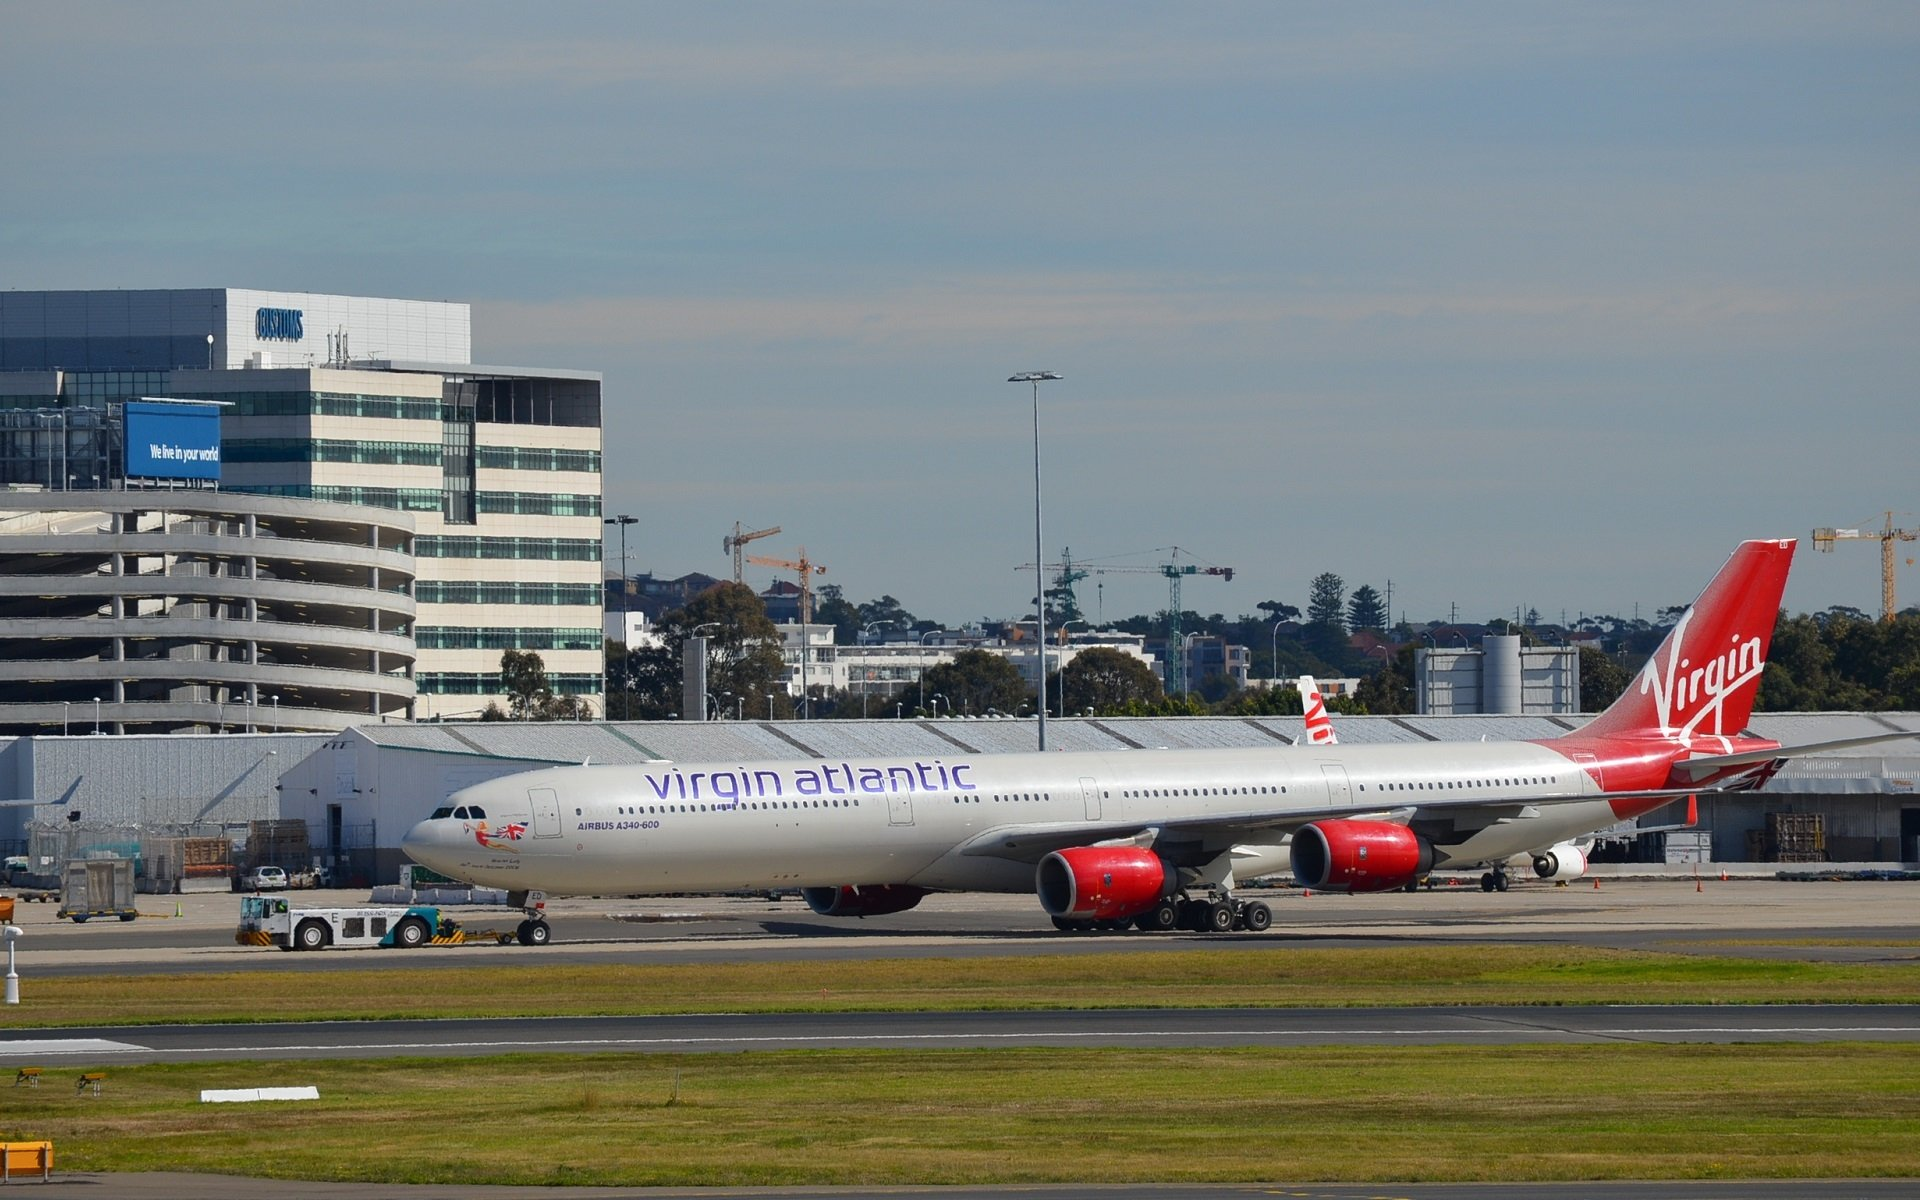 Véhicules - Airbus A340  Airbus Airplane Airport Véhicule Passenger Plane Fond d'écran